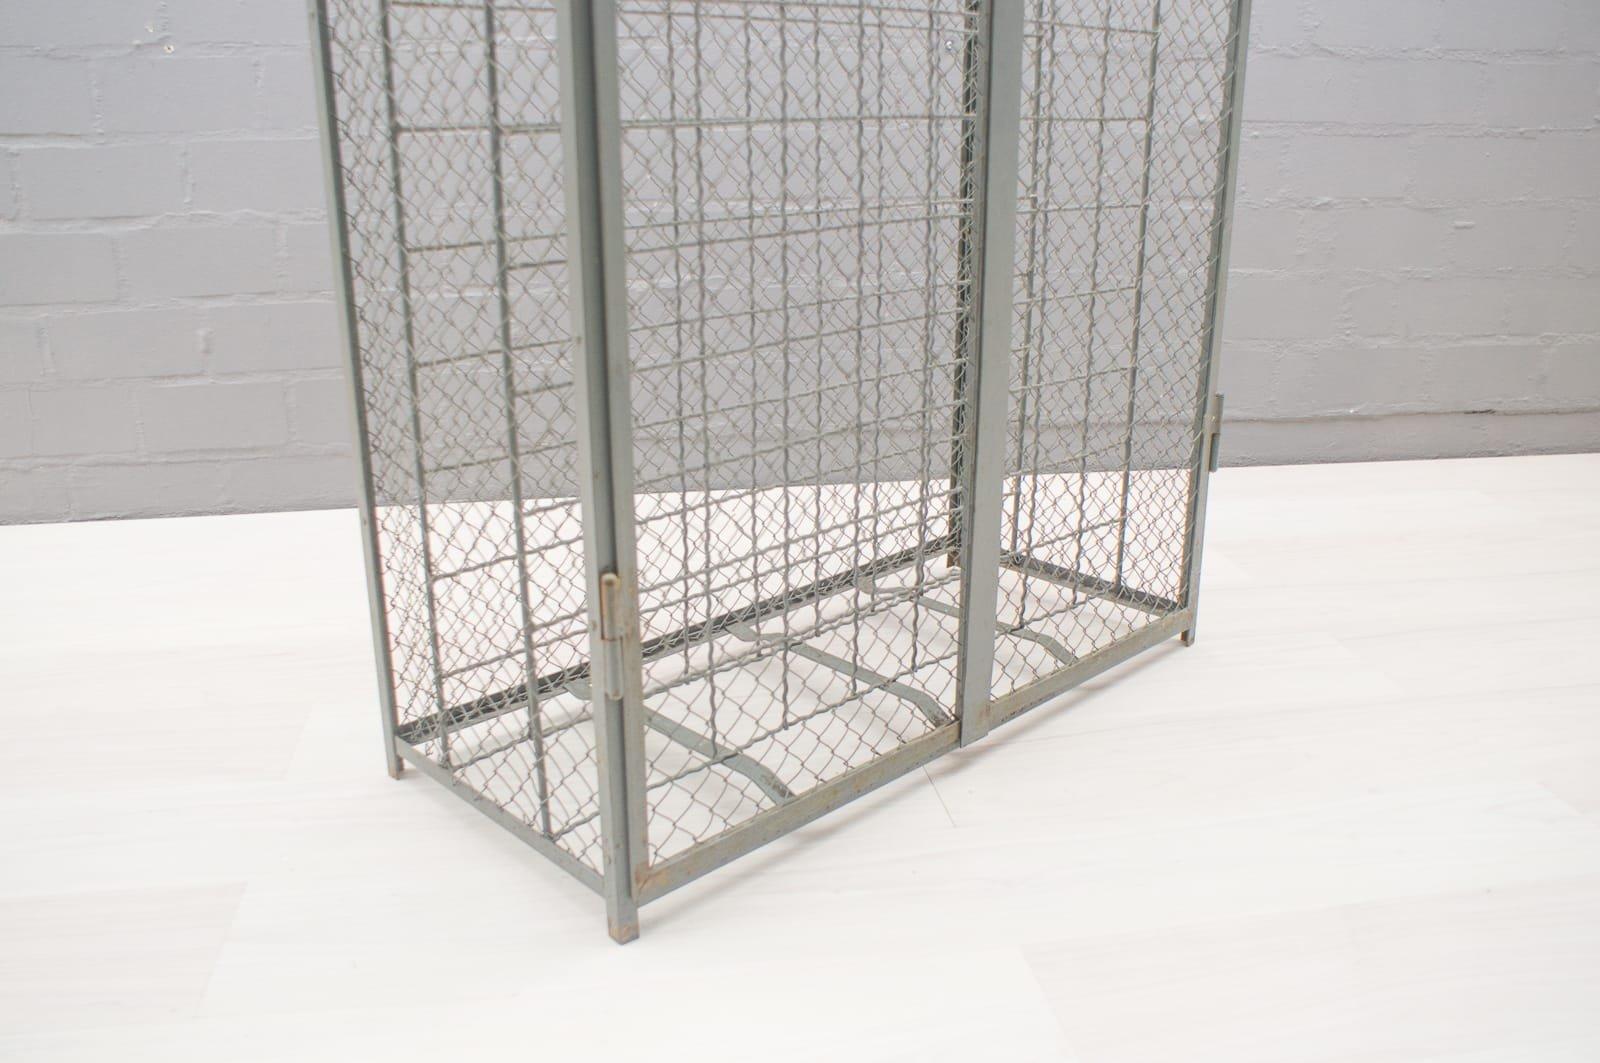 industrielles weinregal aus metall 1950er bei pamono kaufen. Black Bedroom Furniture Sets. Home Design Ideas